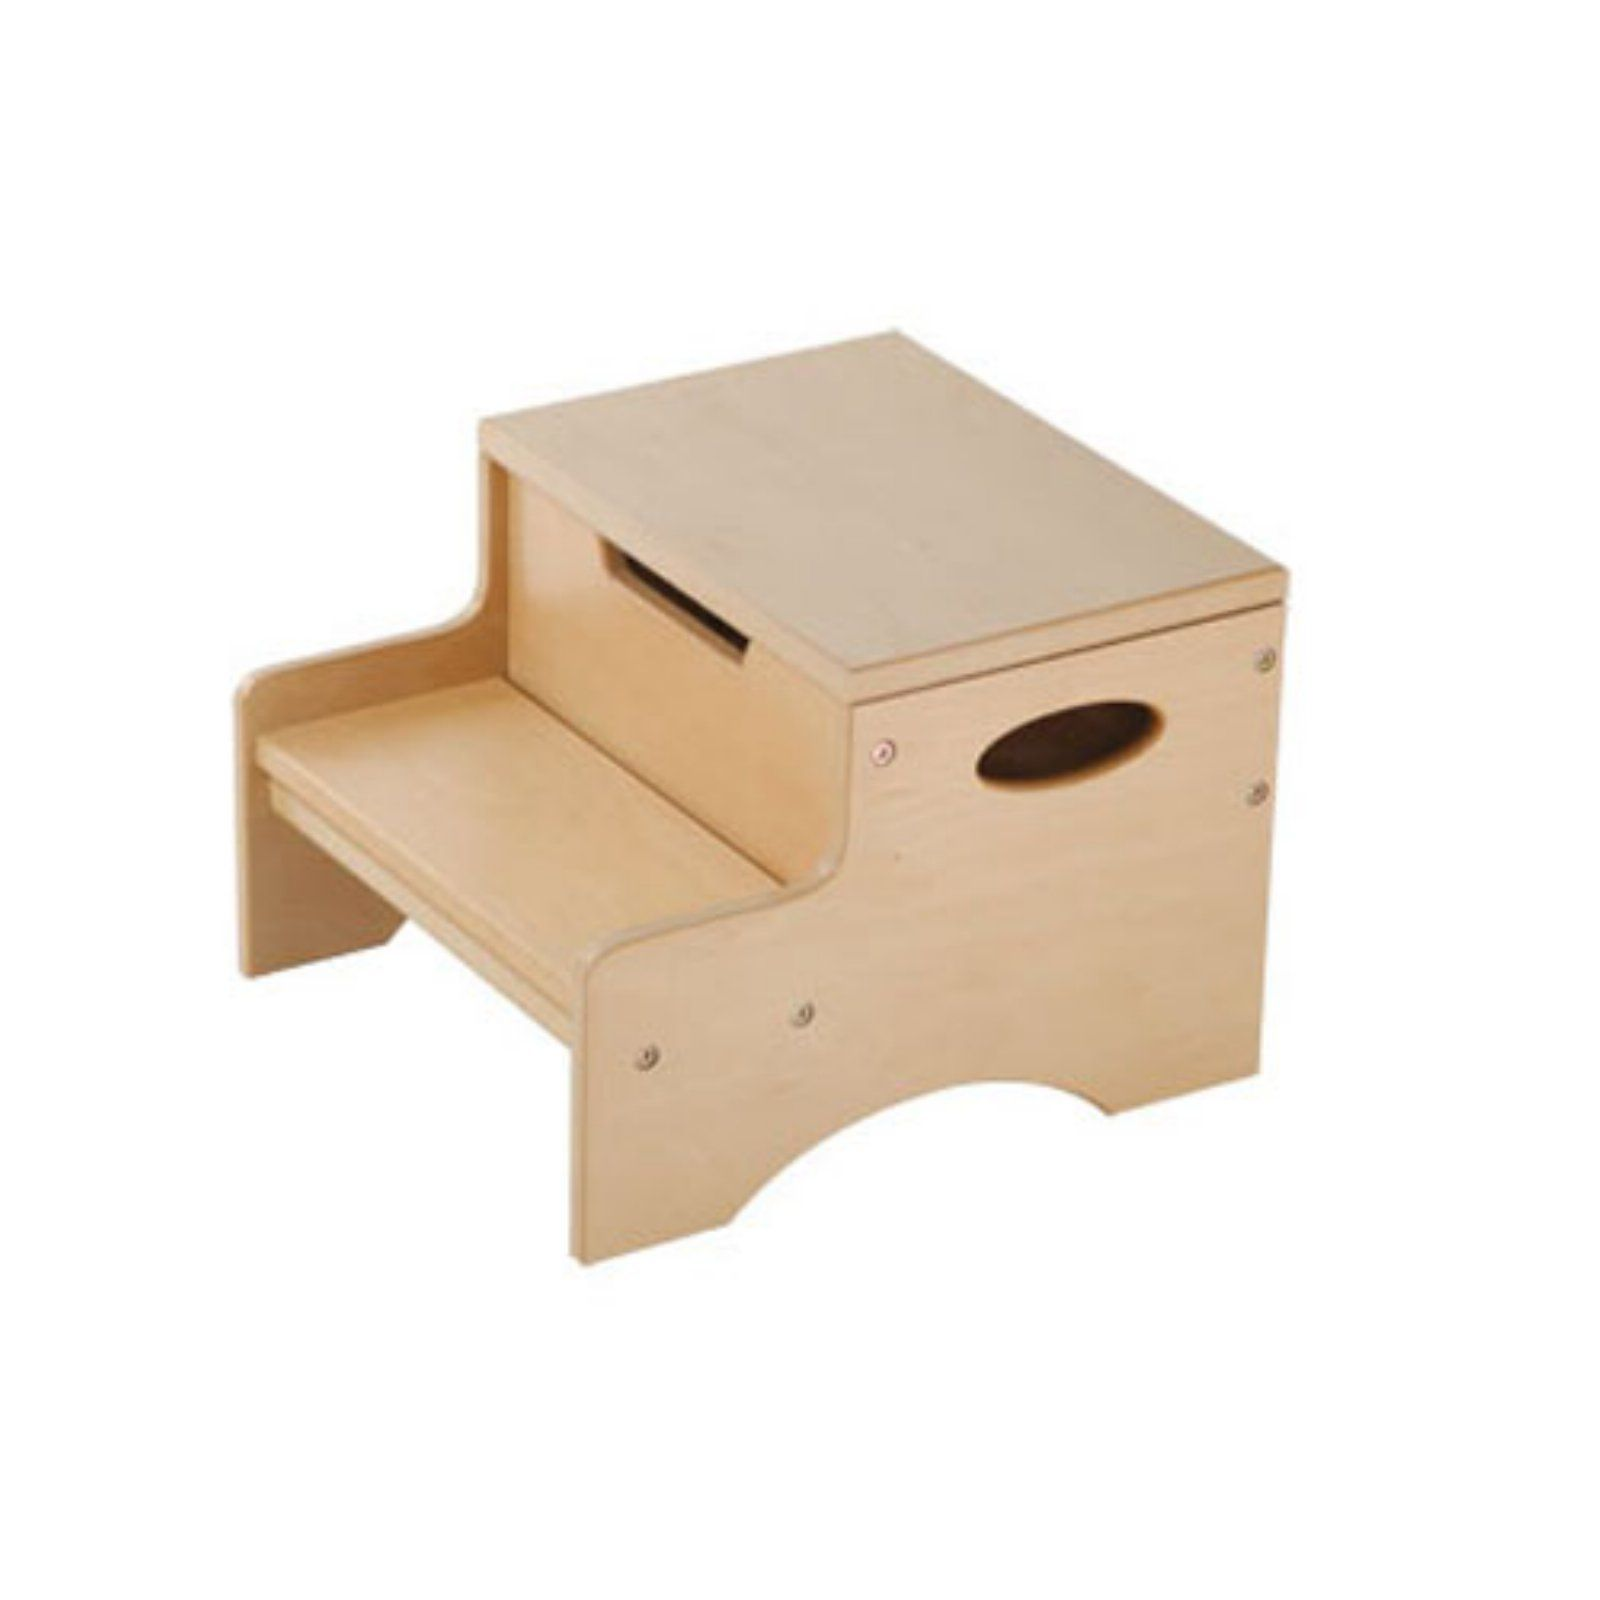 Natural 15511 KidKraft Two-Step Stool Step Stools Indoor Furniture ...